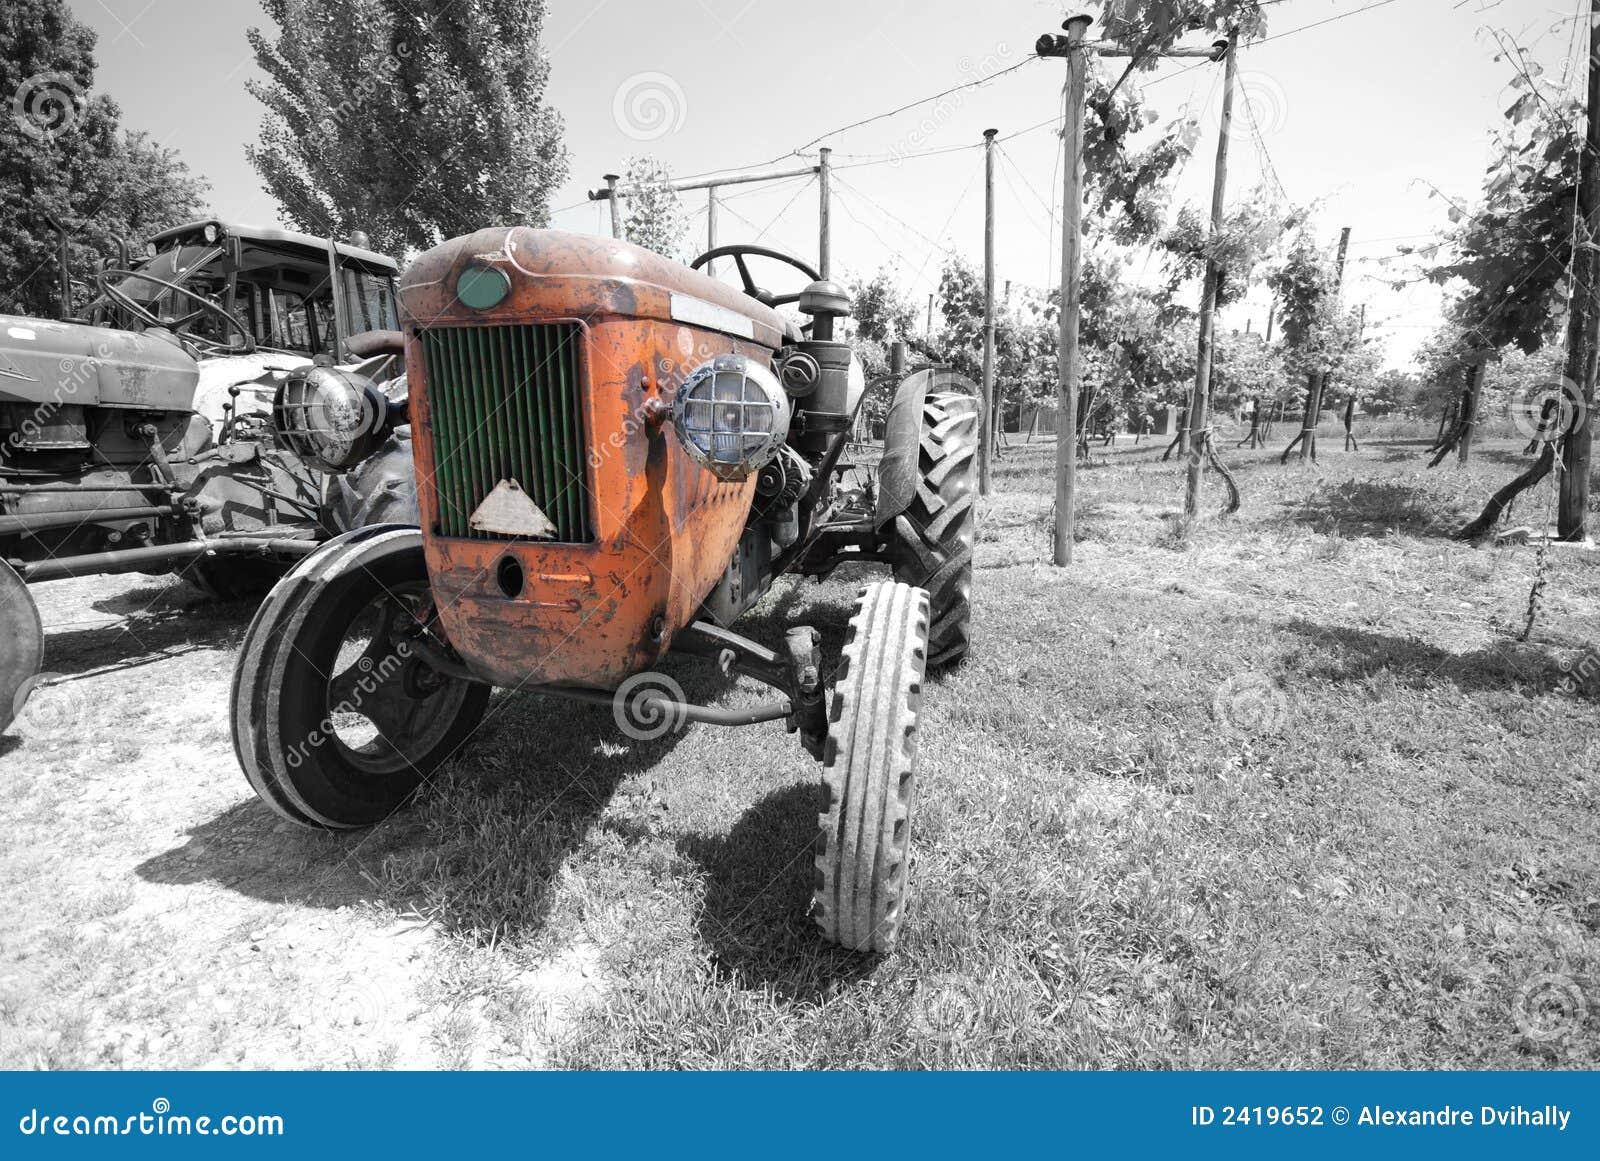 Vintage Tractor Cartoon : Old tractor colour royalty free cartoon cartoondealer